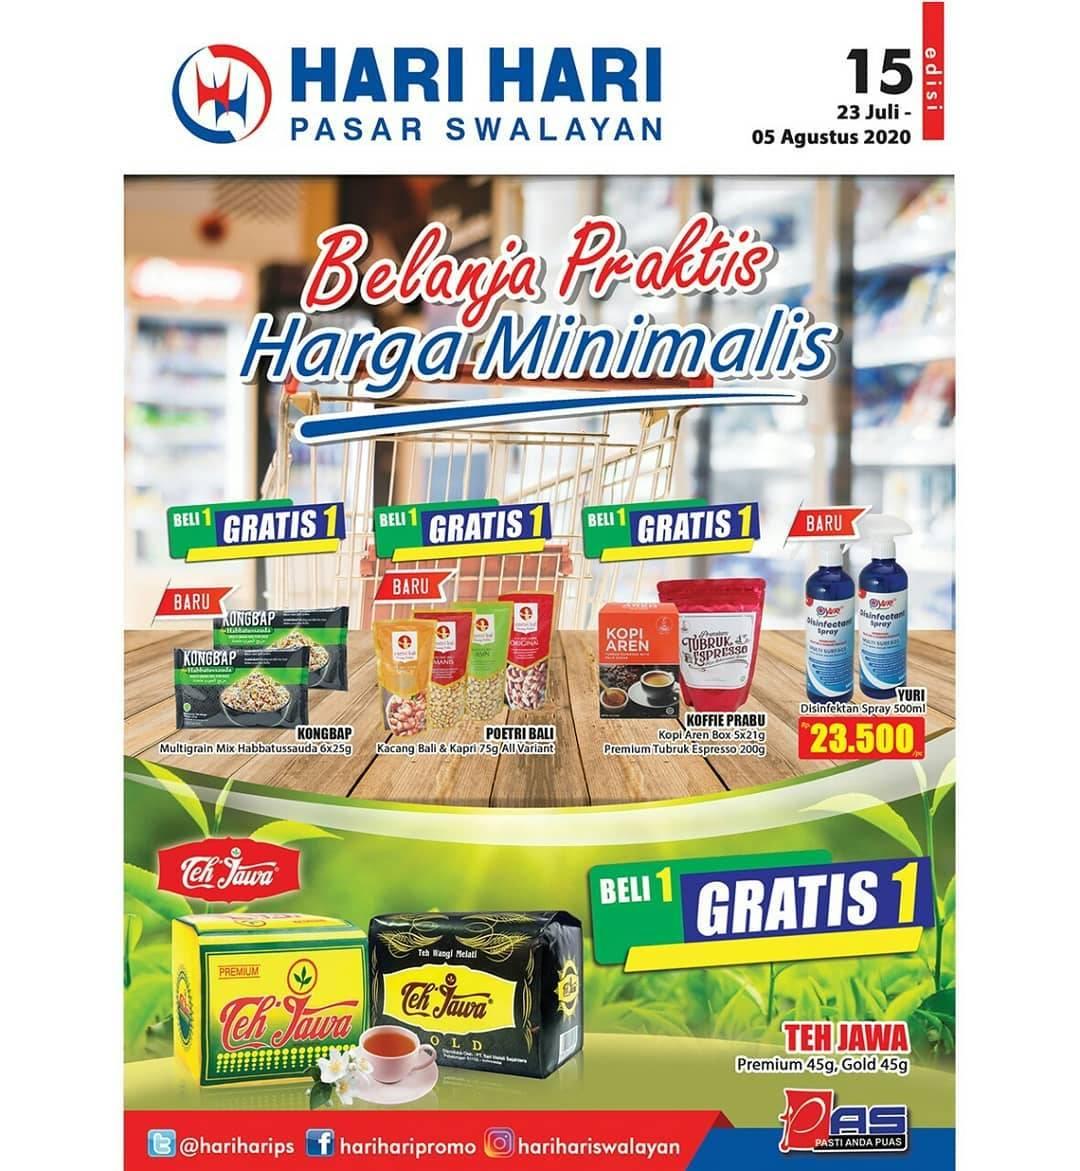 Diskon Katalog Promo Hari Hari Swalayan Harga Minimalis Periode 23 Juli - 5 Agustus 2020